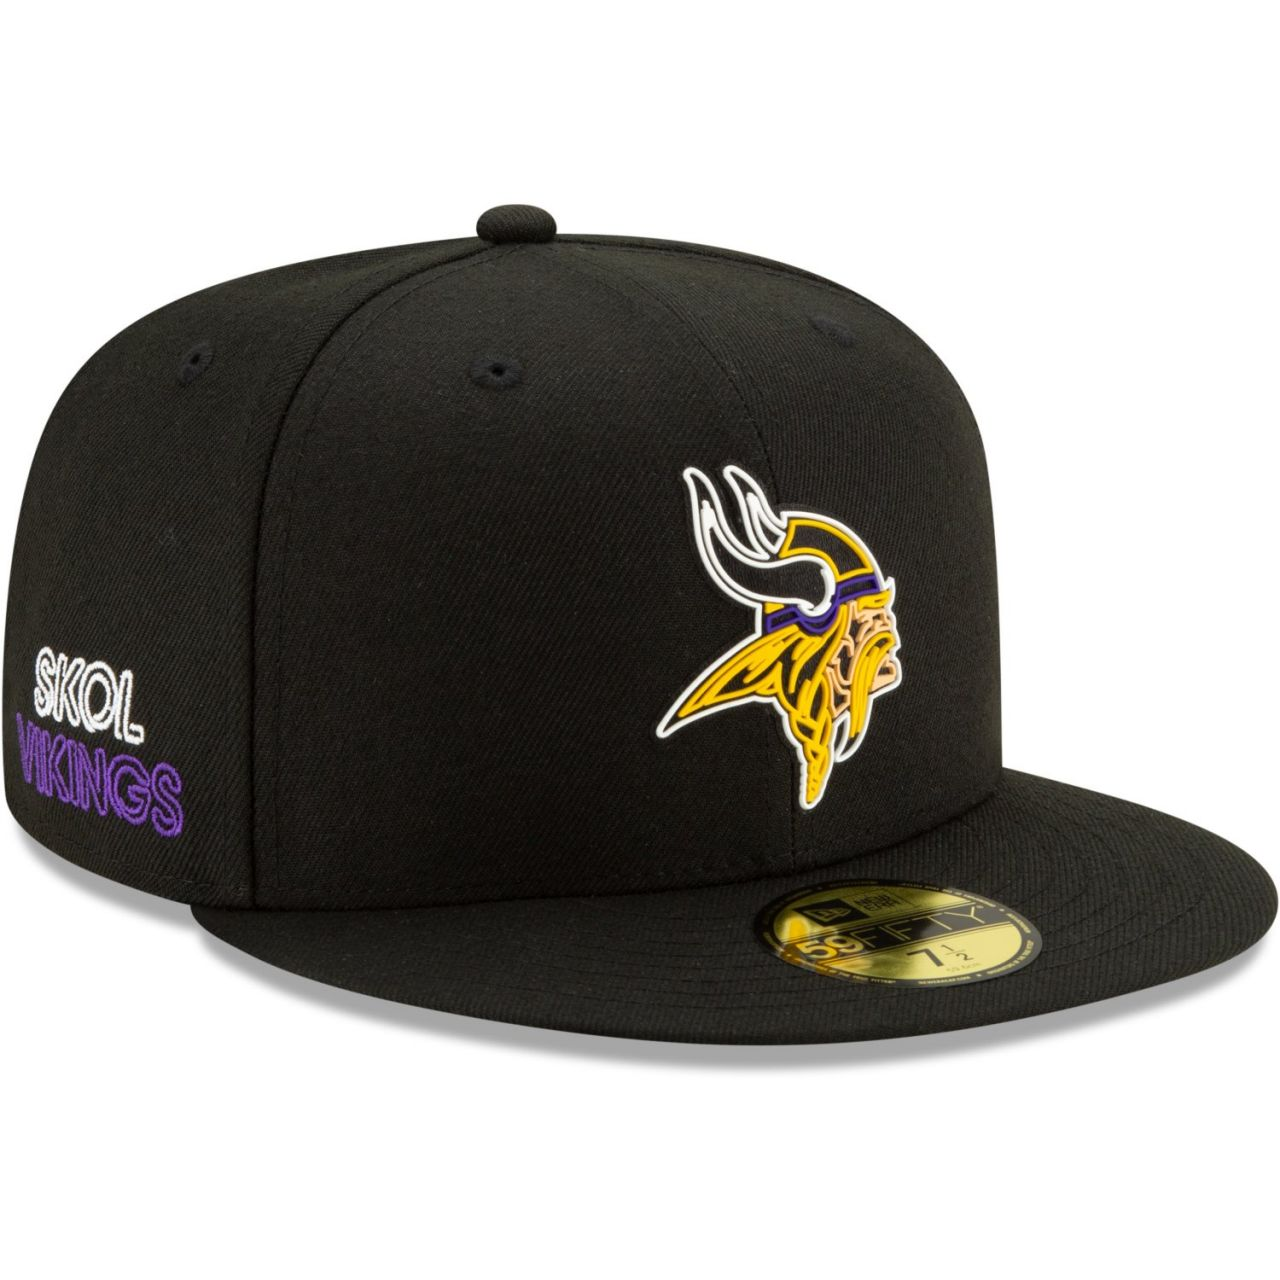 amfoo - New Era 59Fifty Cap - NFL 2020 DRAFT Minnesota Vikings